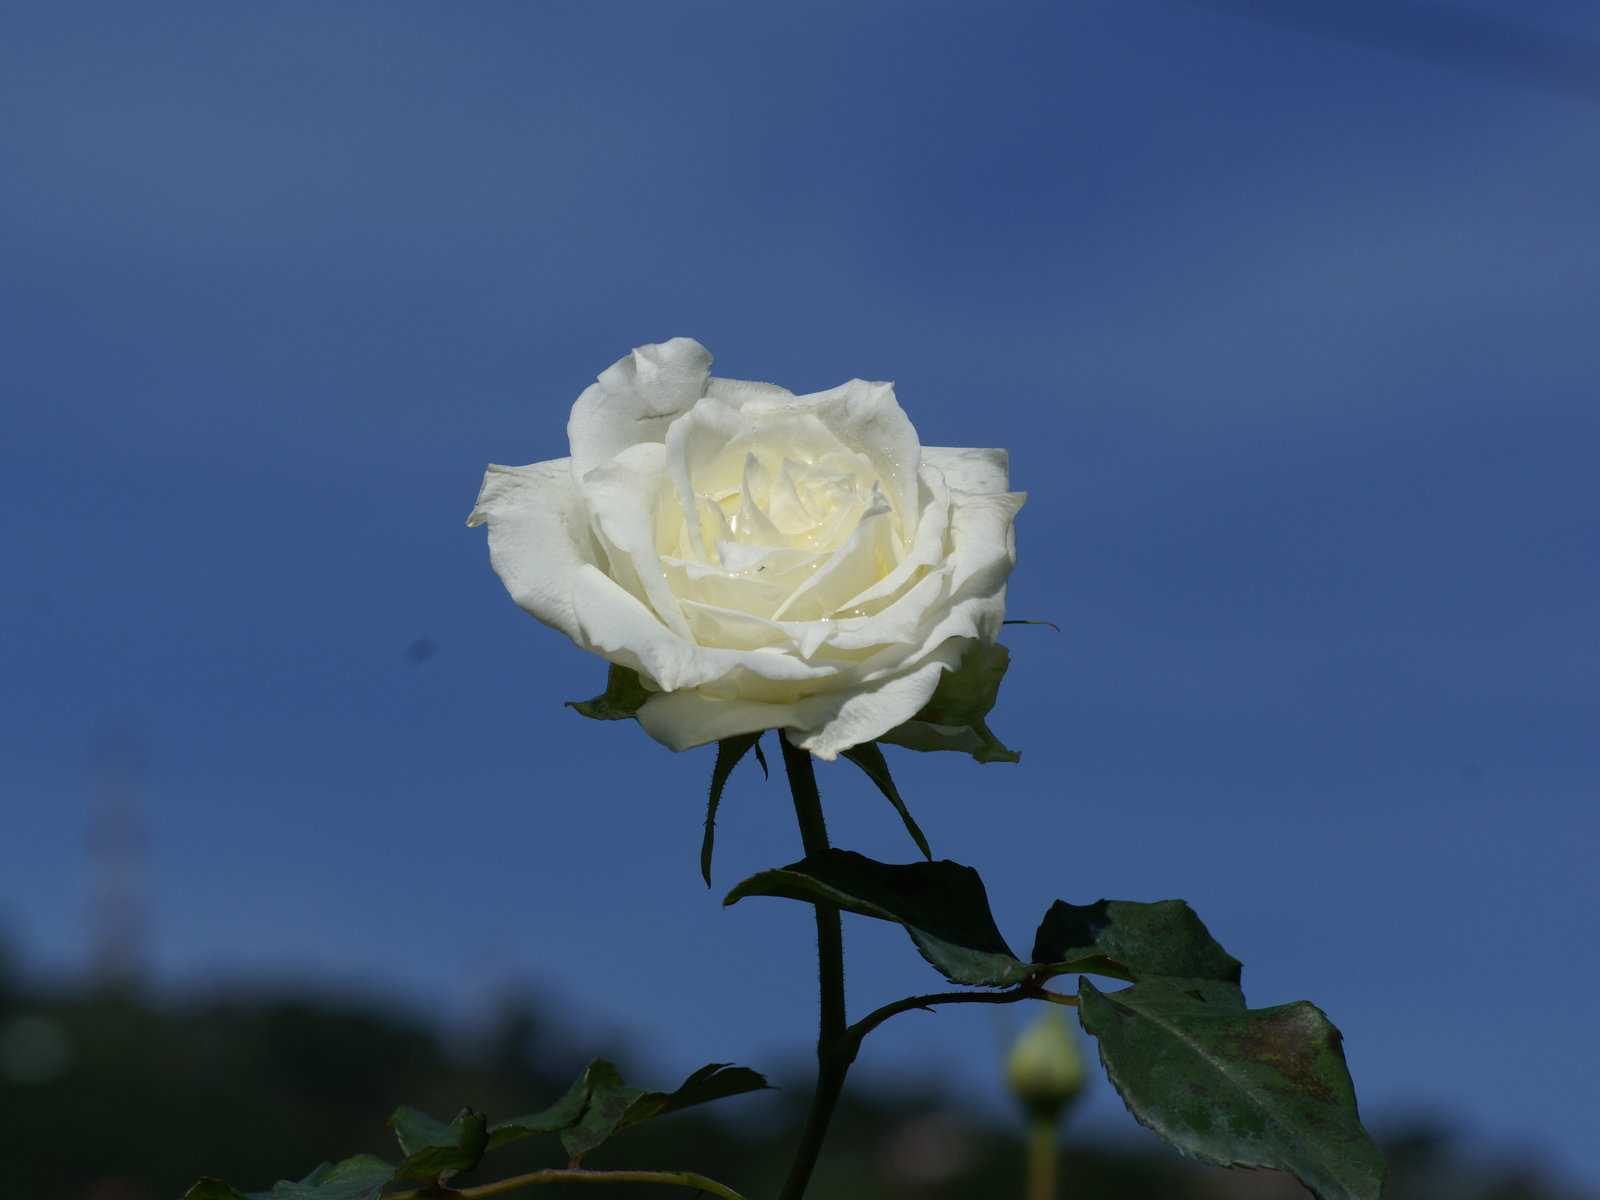 les plus belles roses photos des belles roses philippines. Black Bedroom Furniture Sets. Home Design Ideas